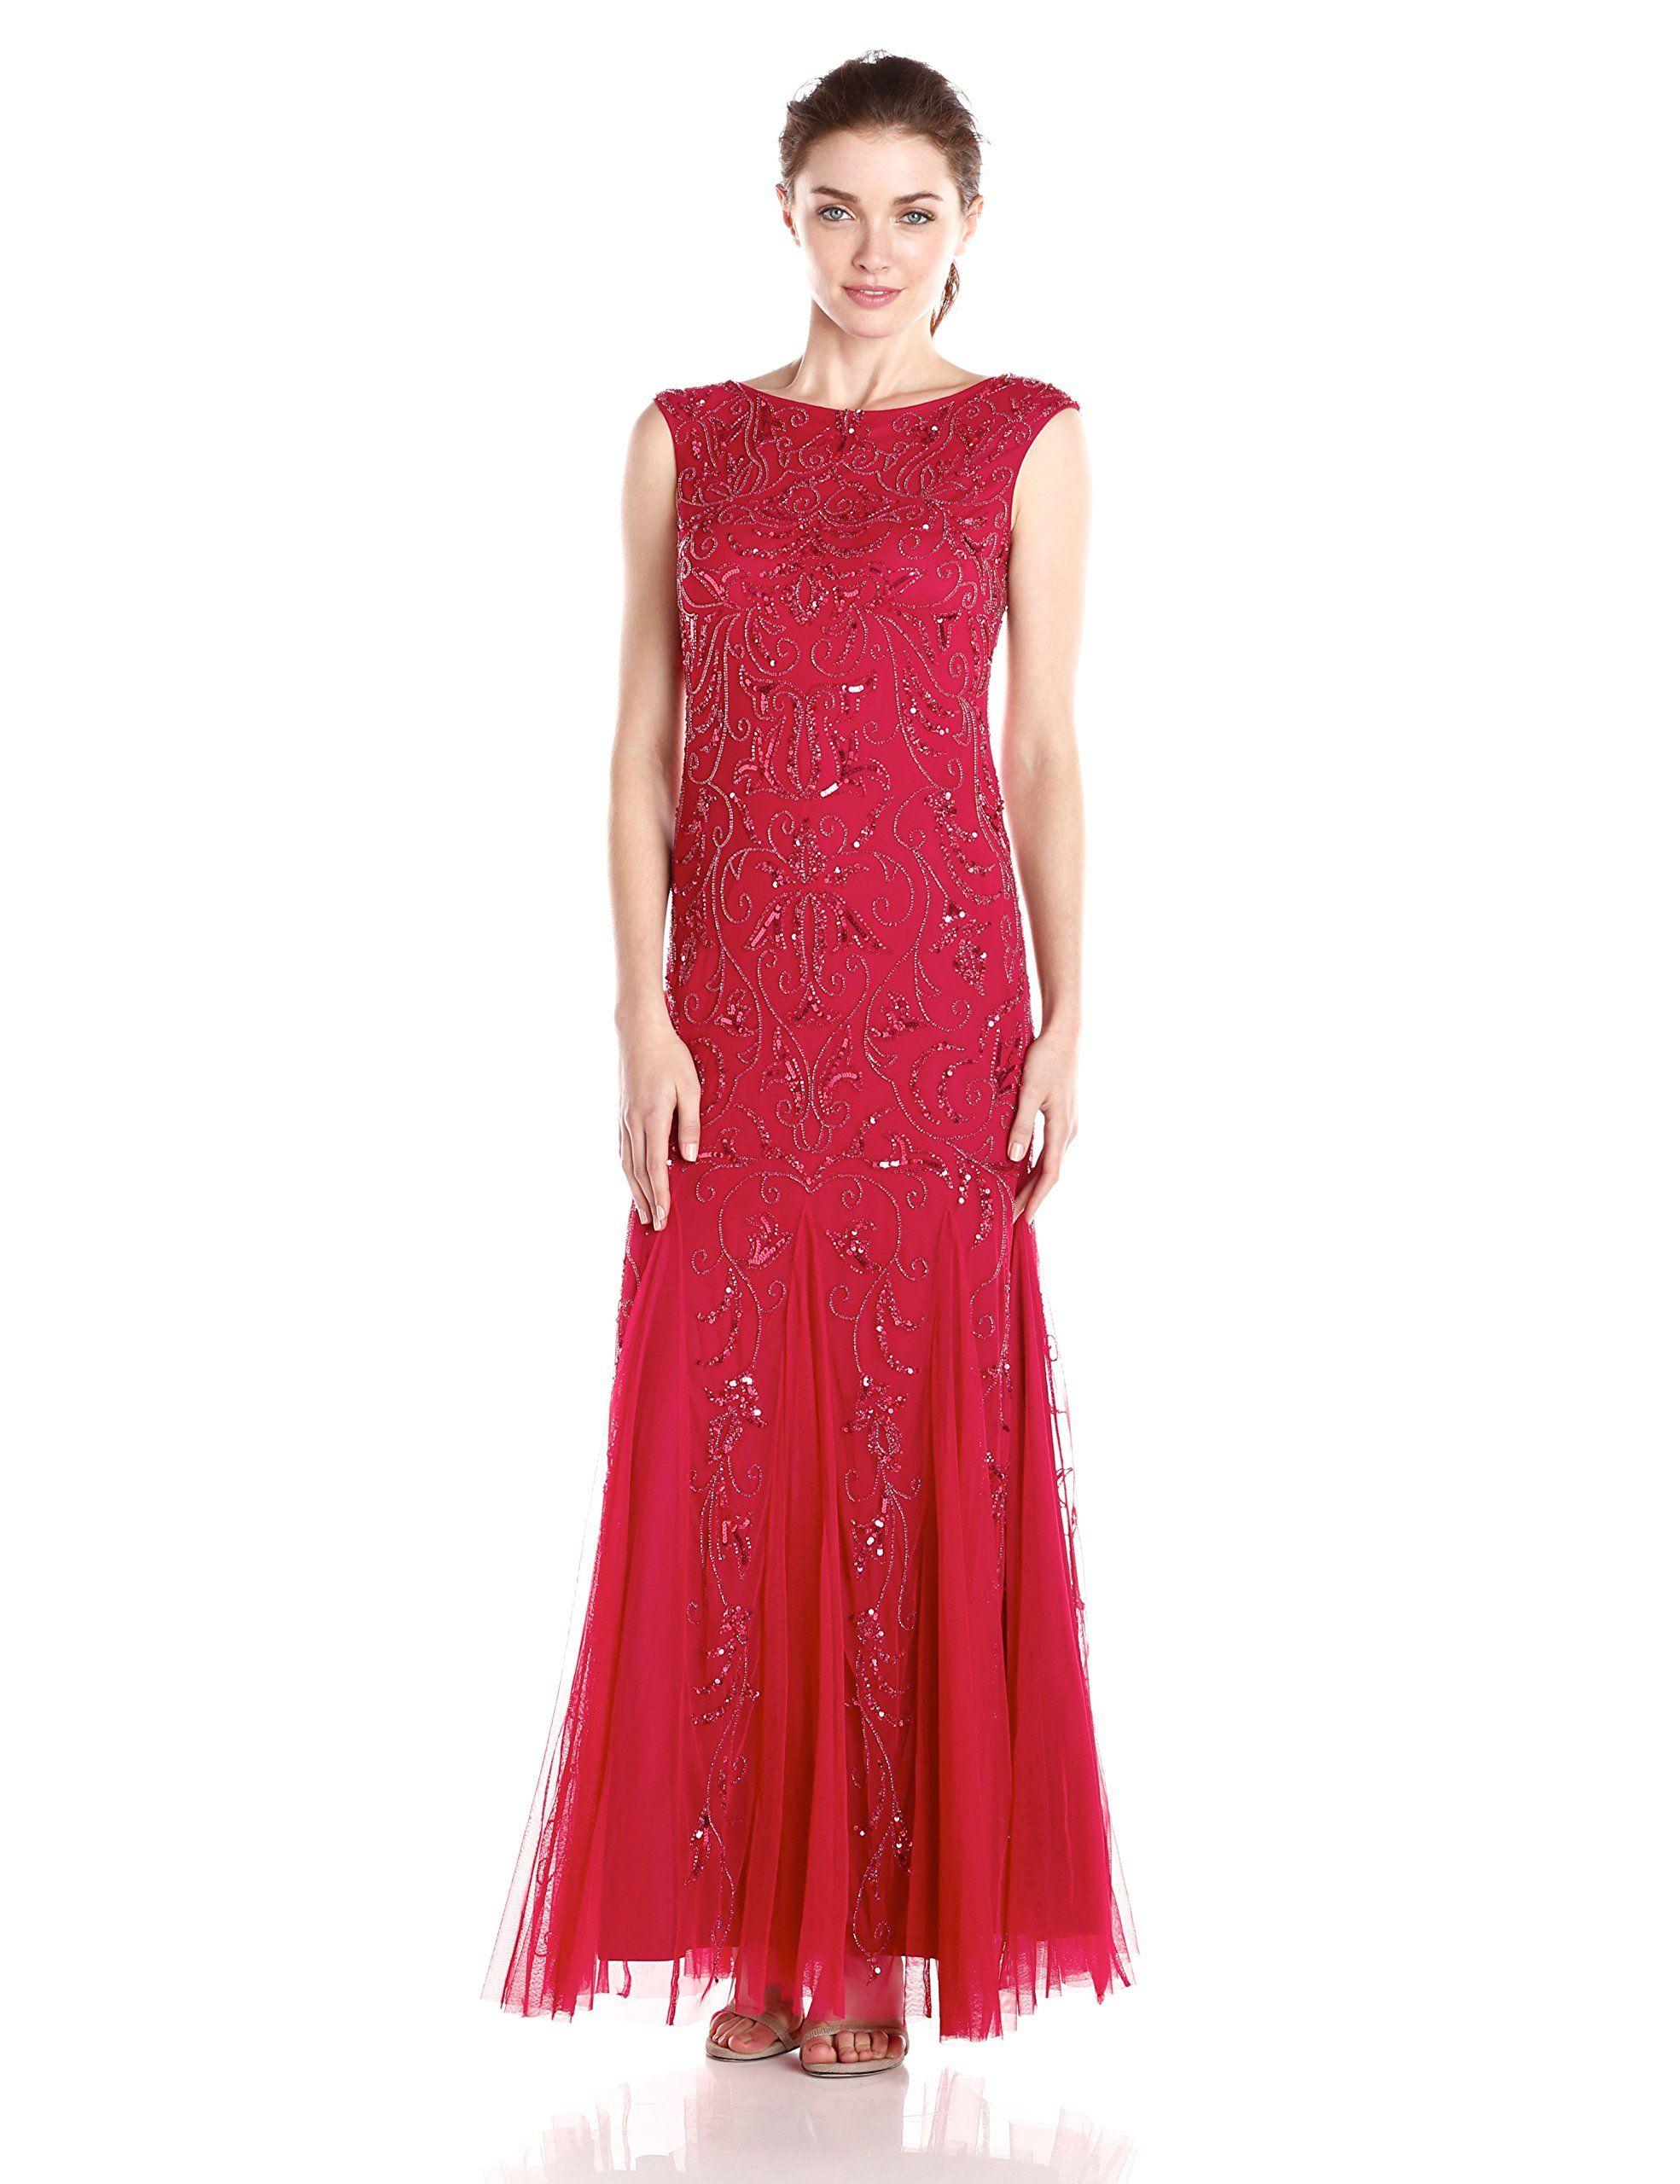 Adrianna Papell 3/4 Sleeve Lace Jacket Dress   Dillards